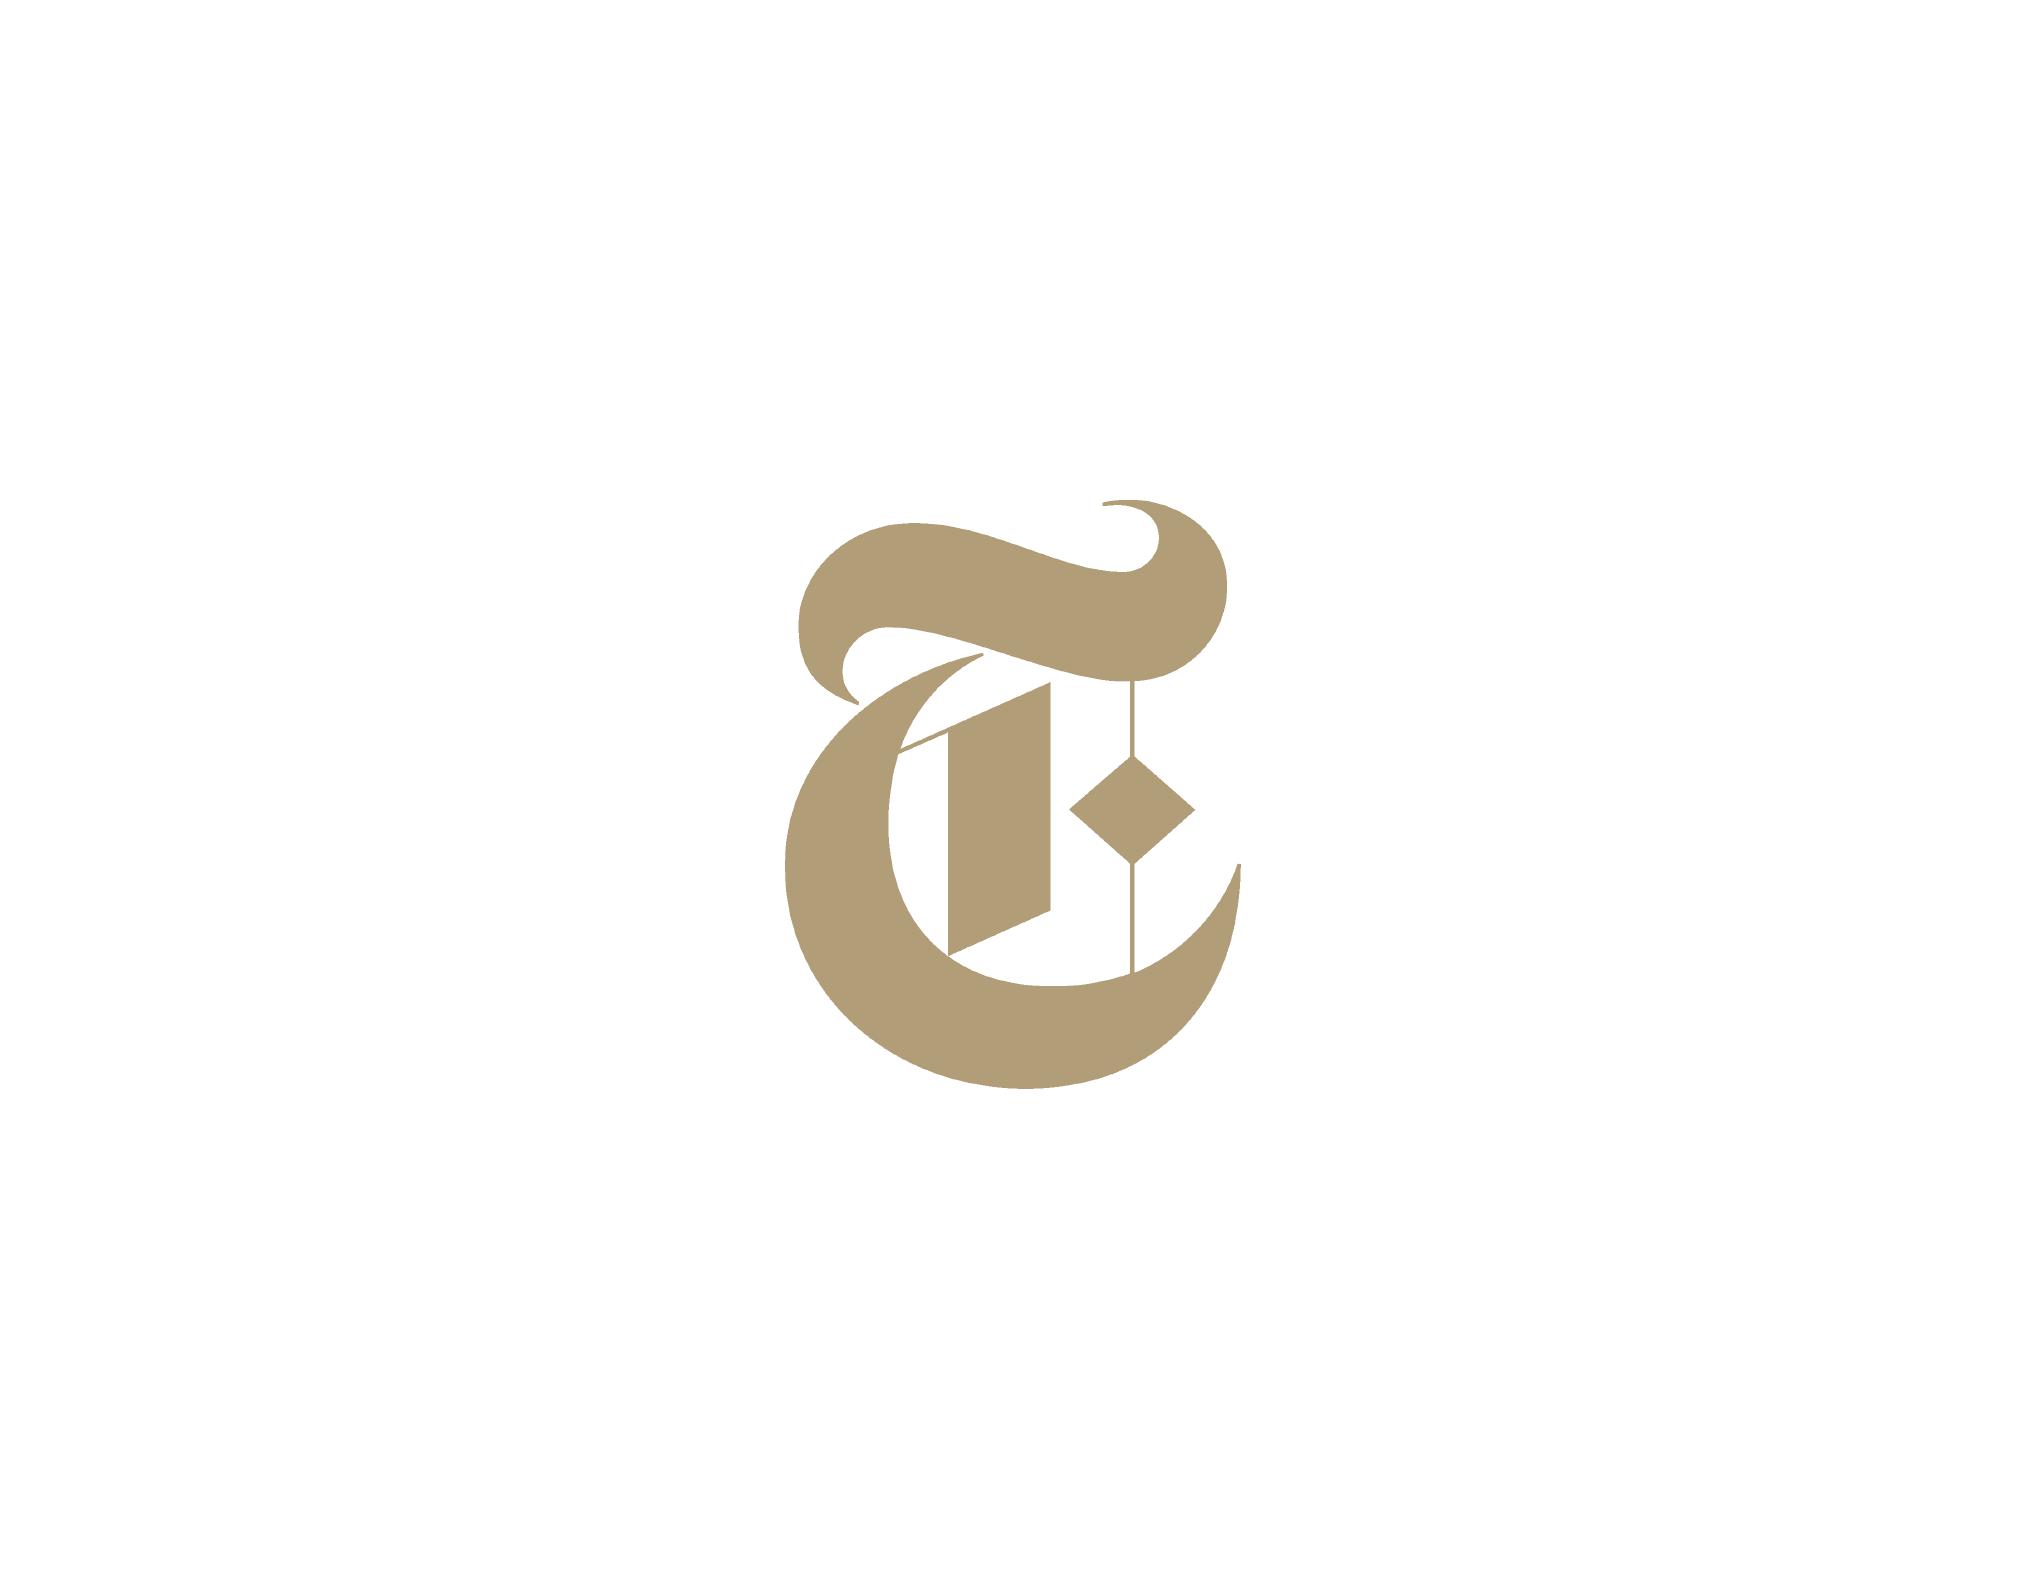 Press_Logo_NewYorkTimes_New York Times.png